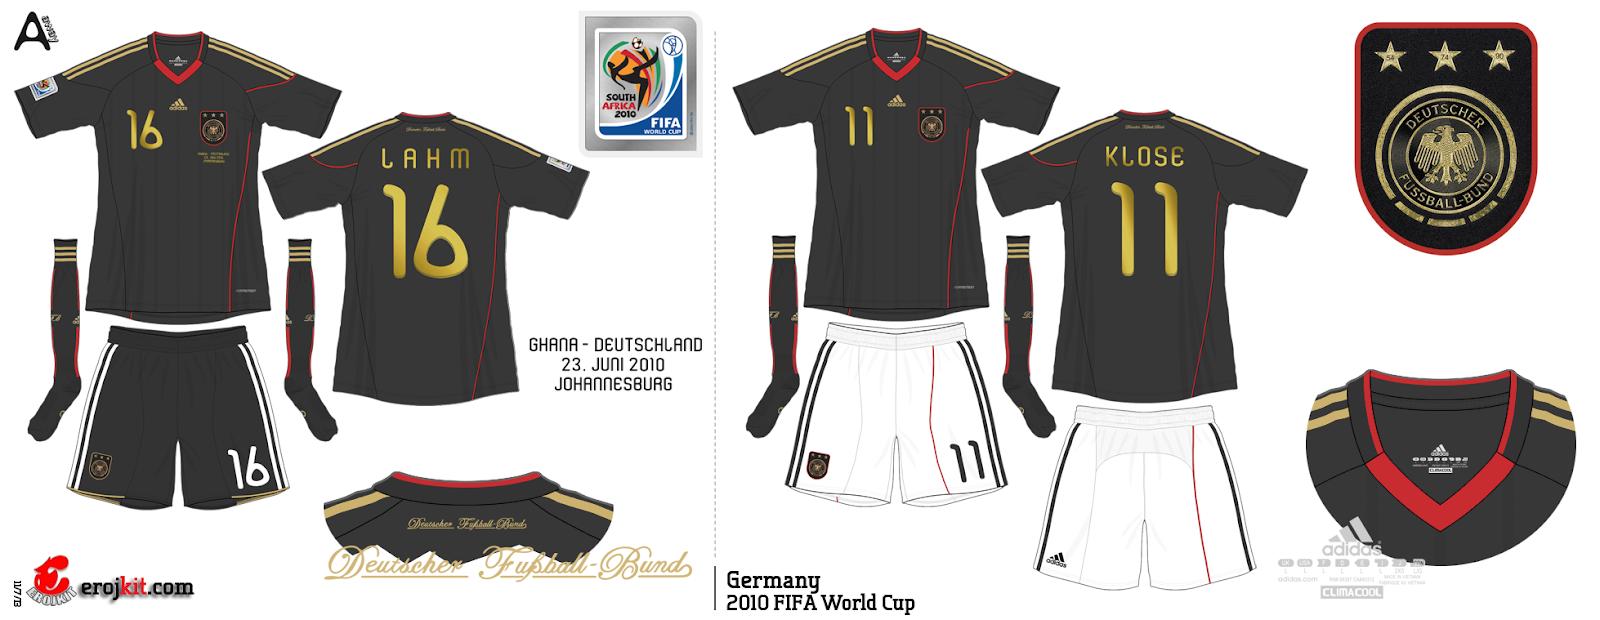 Usou seus dois uniformes na Copa a203cc37301bc